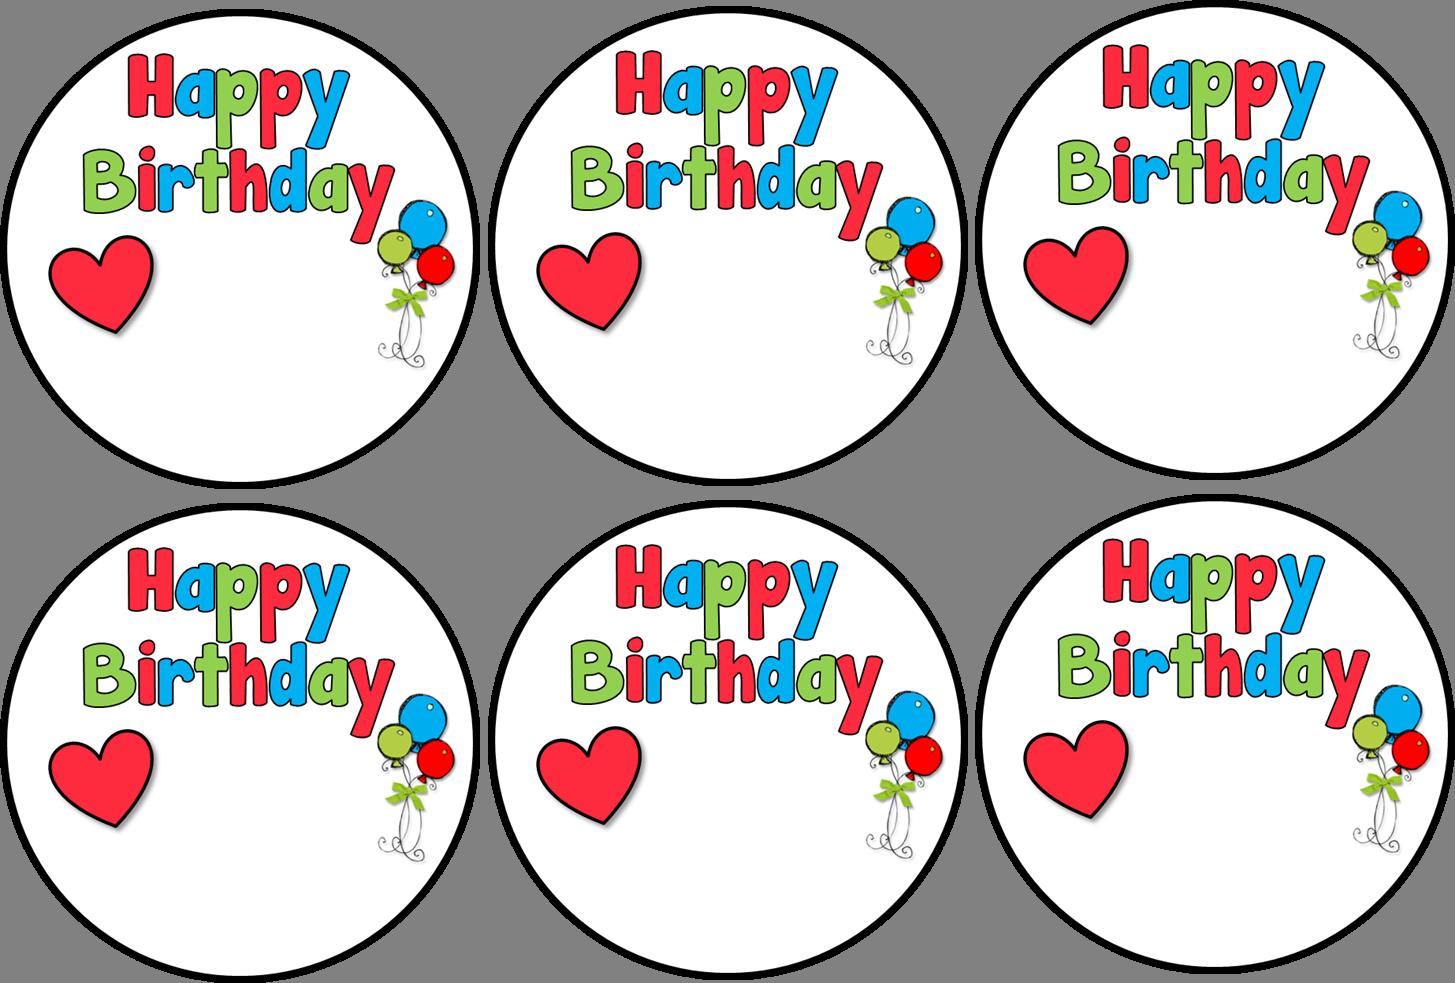 Birthday Tags: Happy Birthday Labels